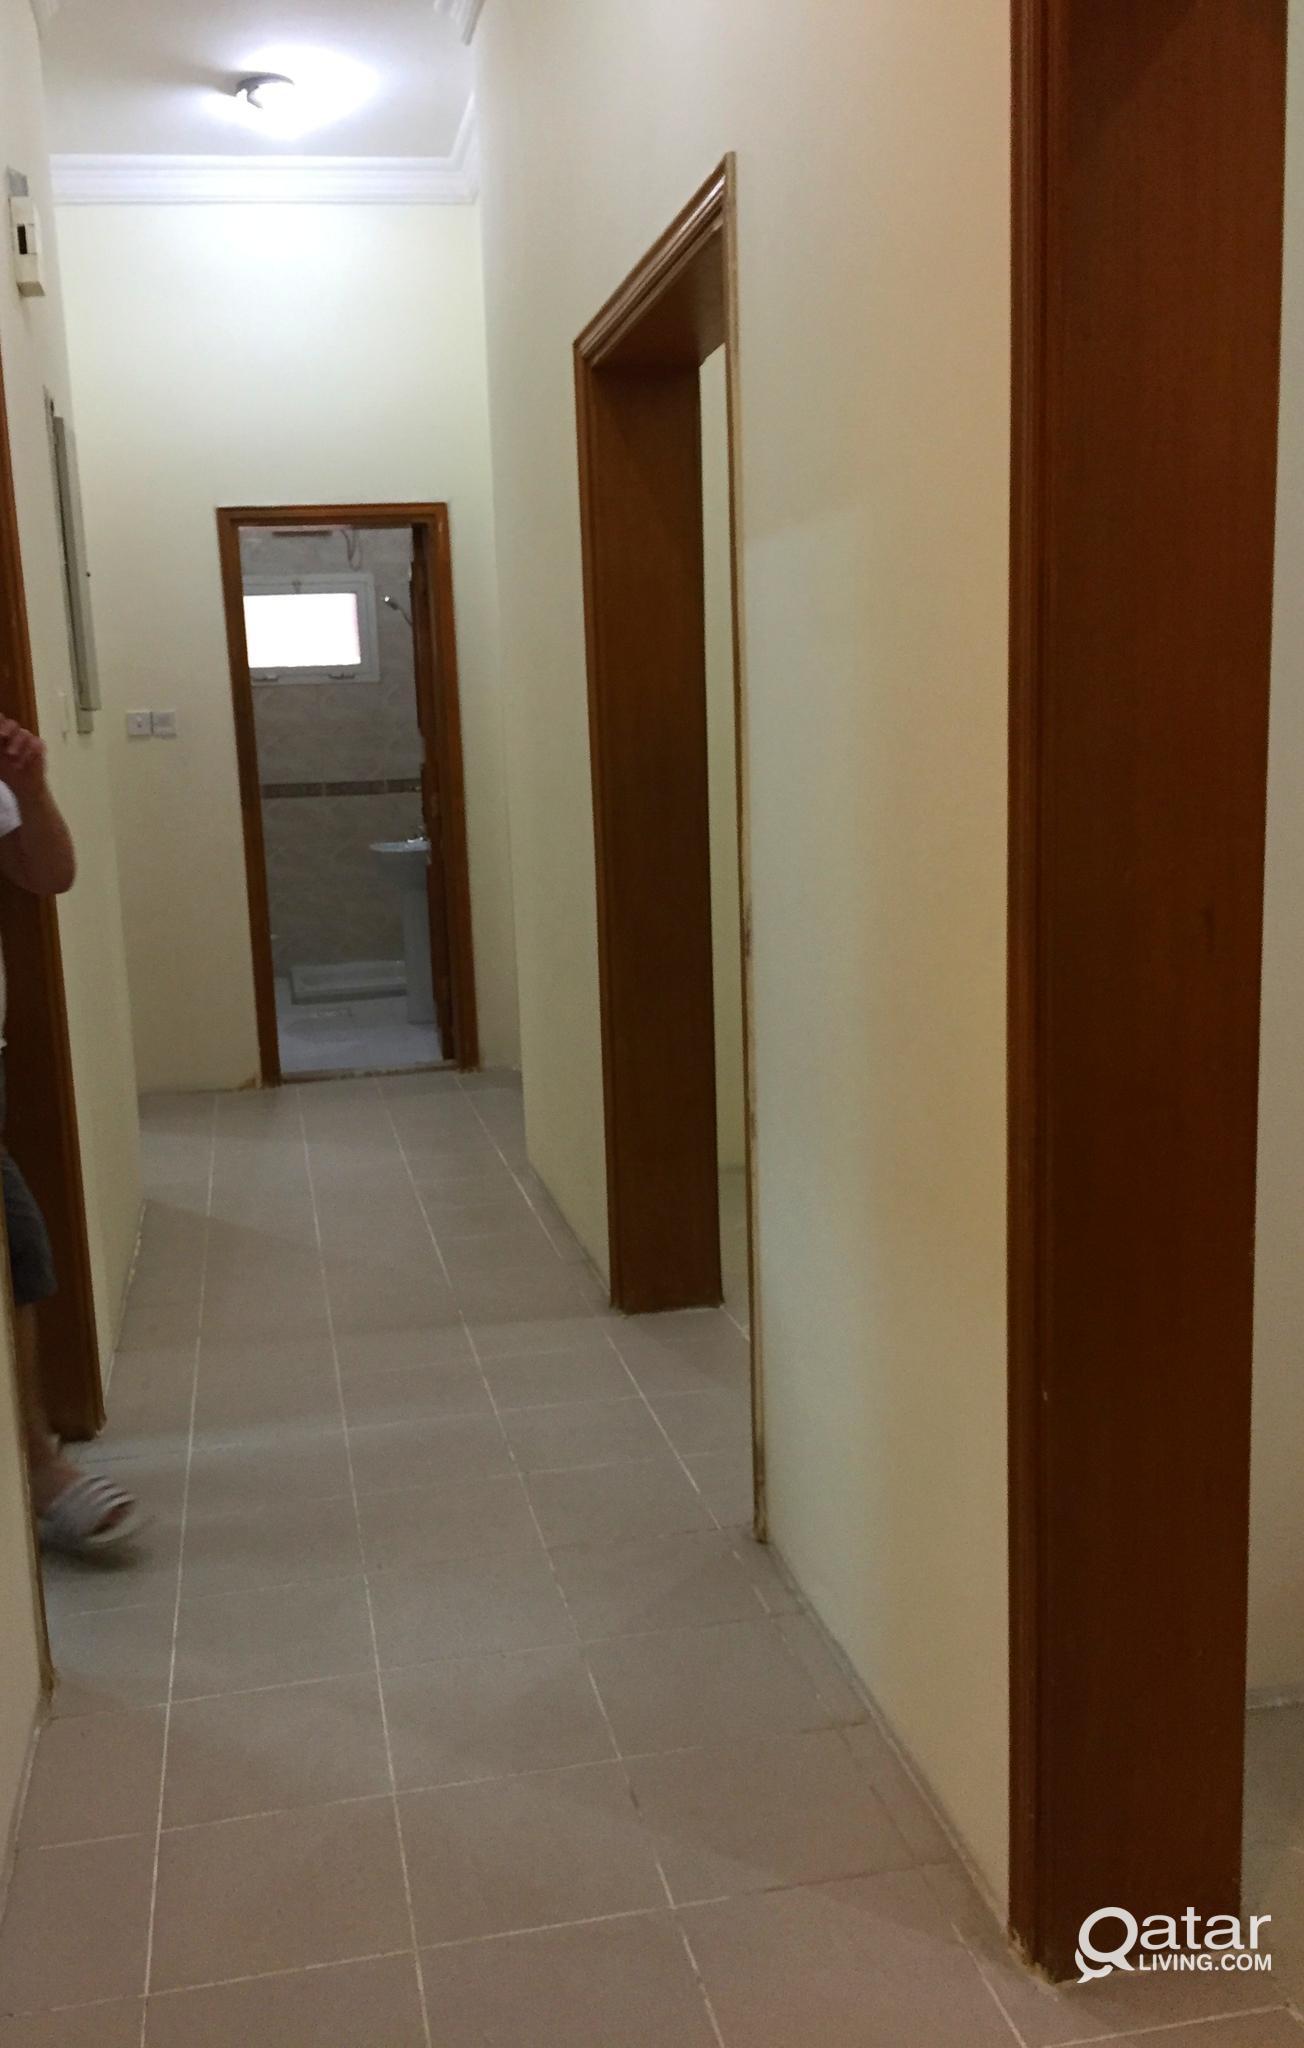 Executive Bachelors Bed space NAJMA - Hygienic & Q